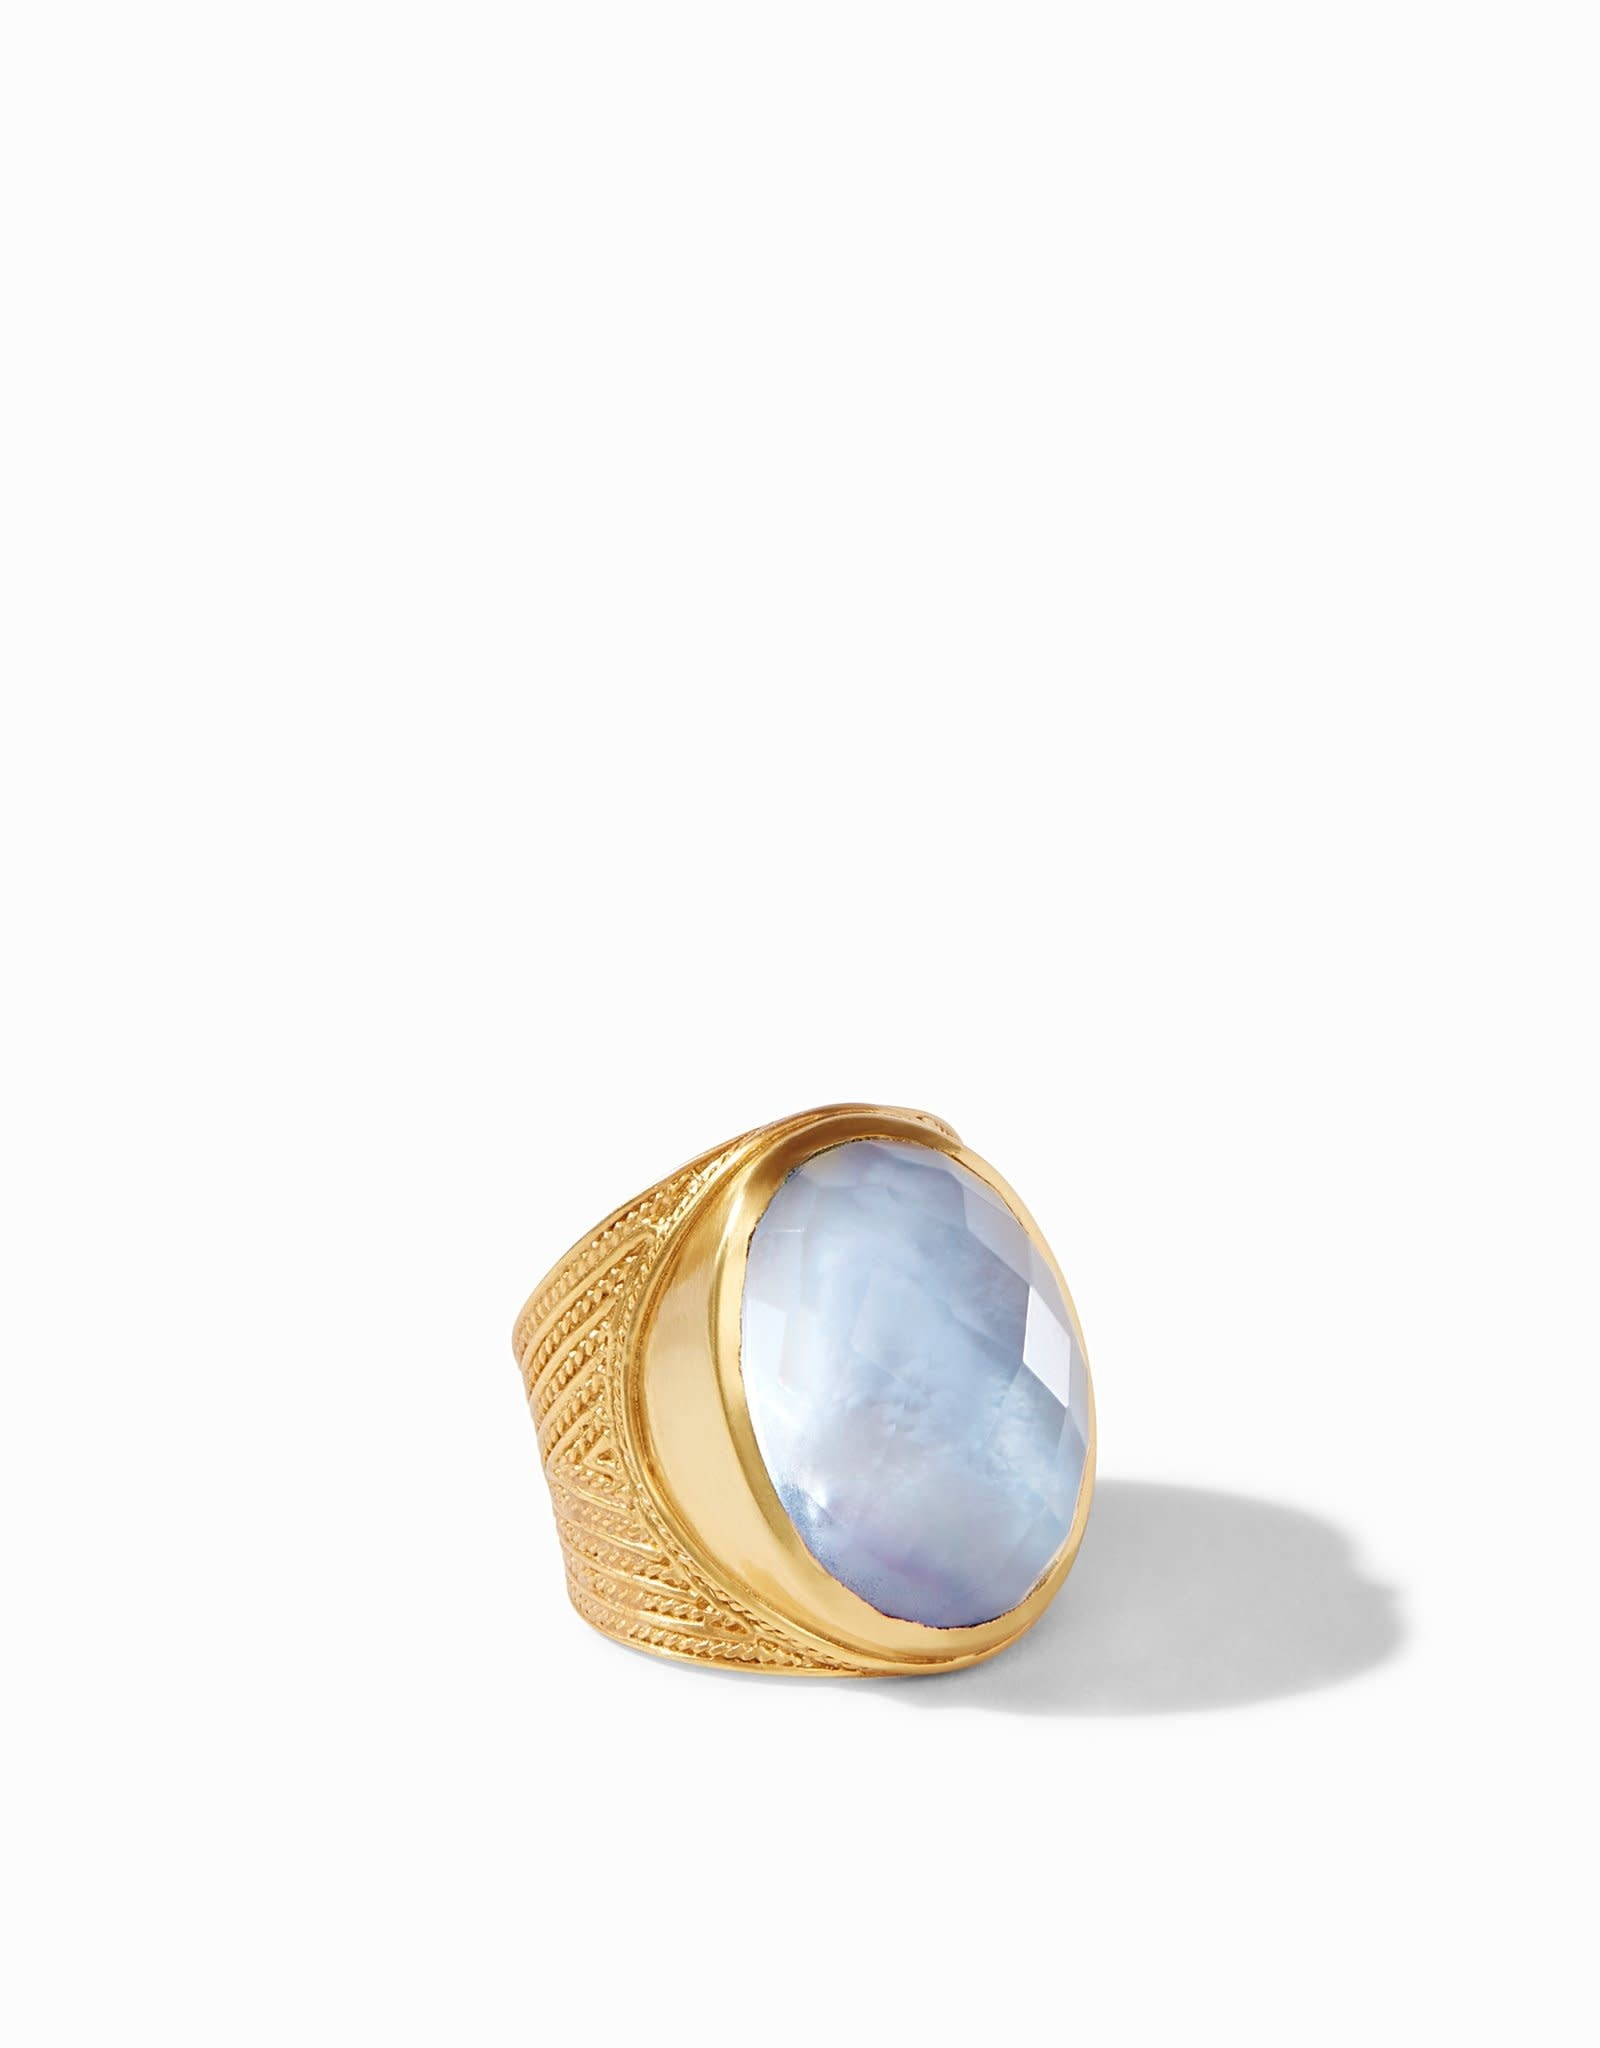 Julie Vos Verona Statement Ring Gold Iridescent Ice Blue - Size  (Adjustable)